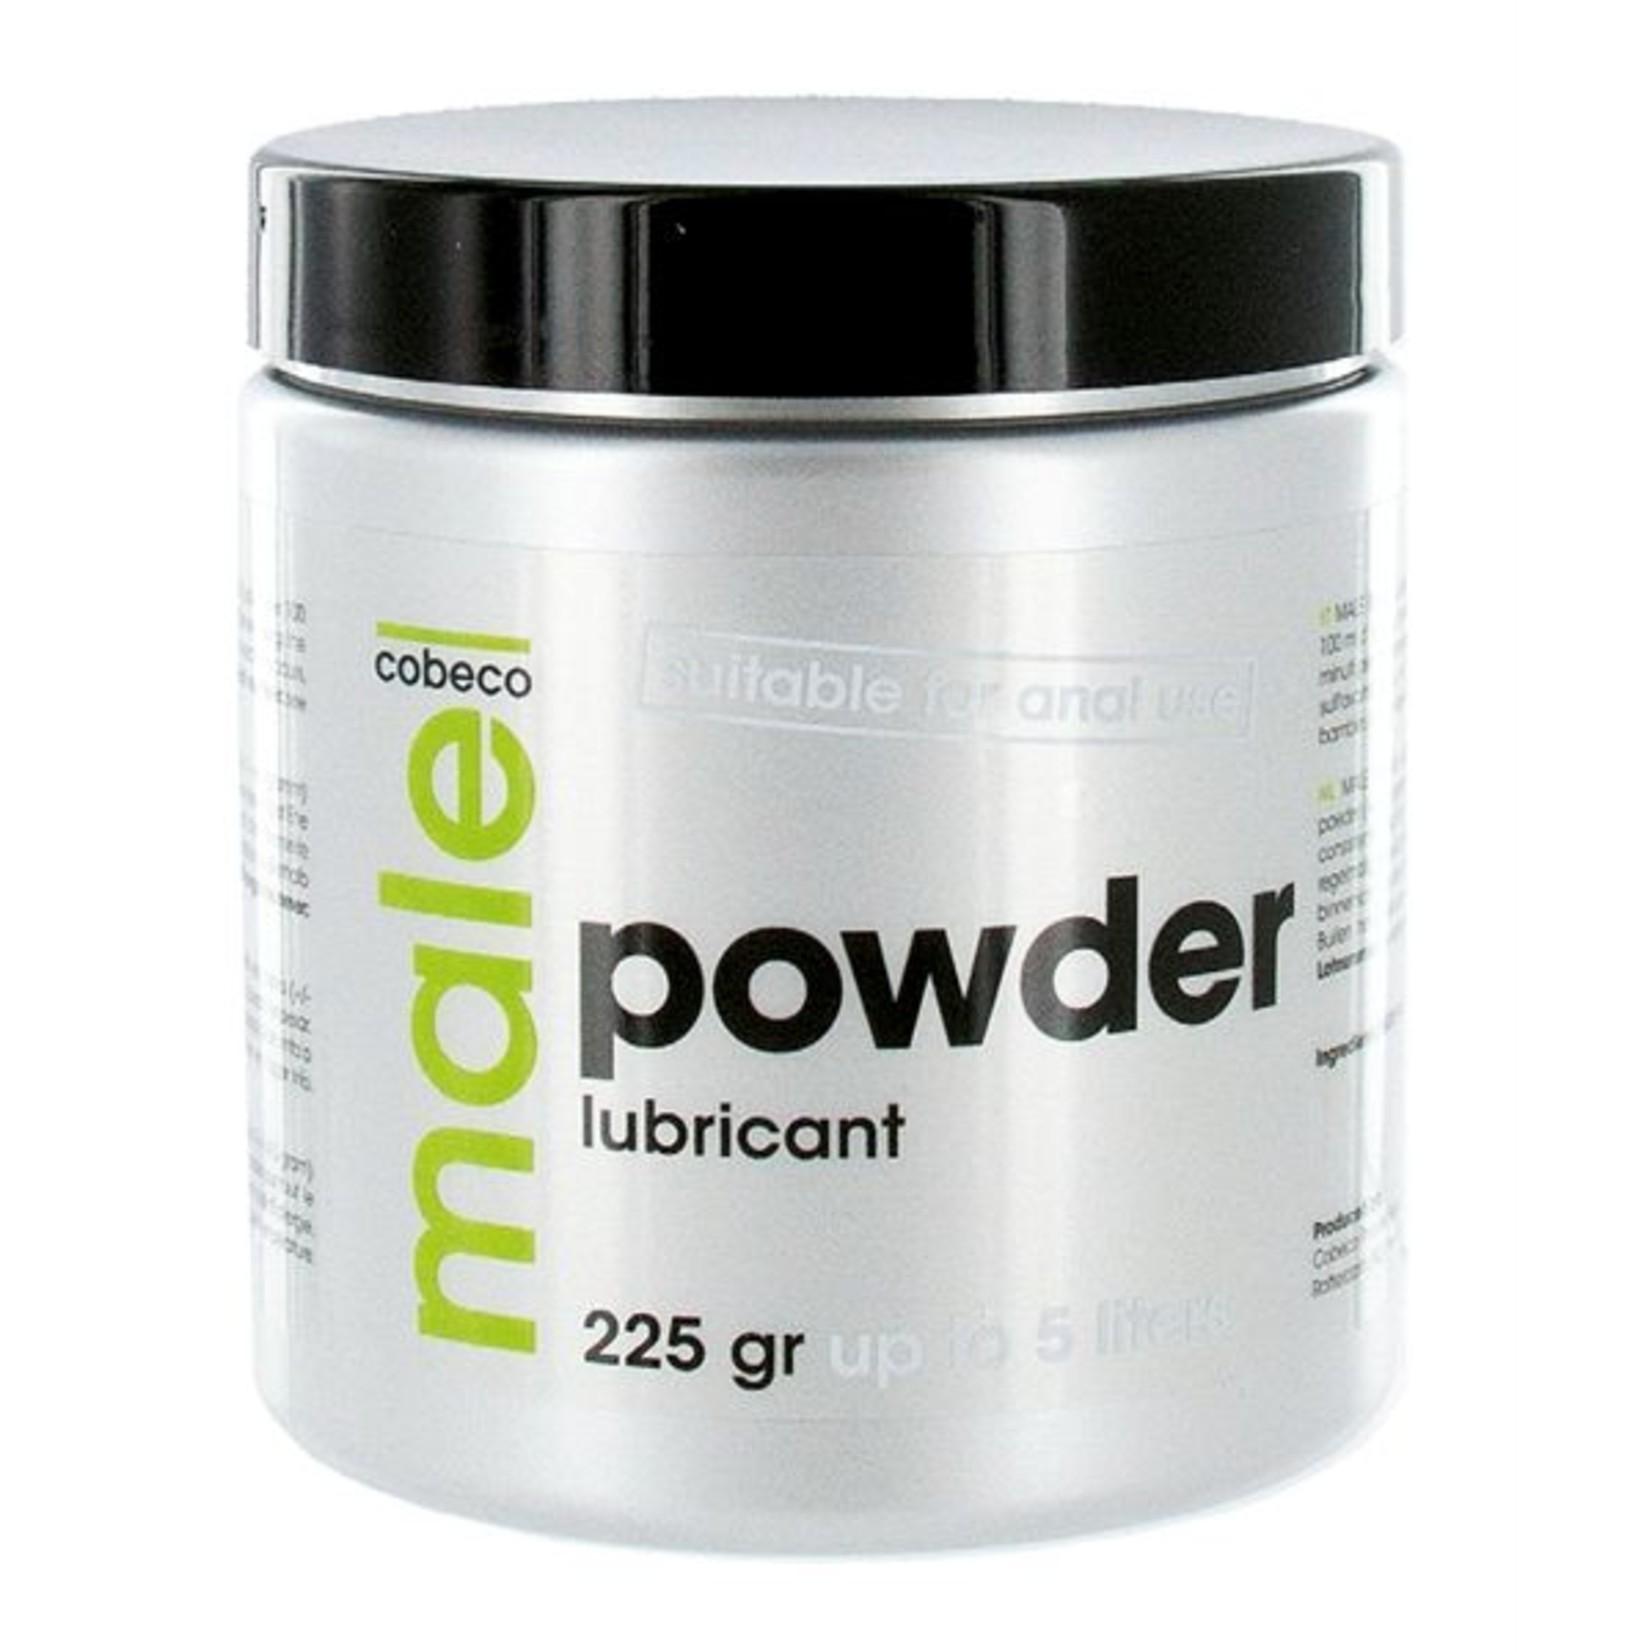 Other Male Powder Lubricant (225 gr)